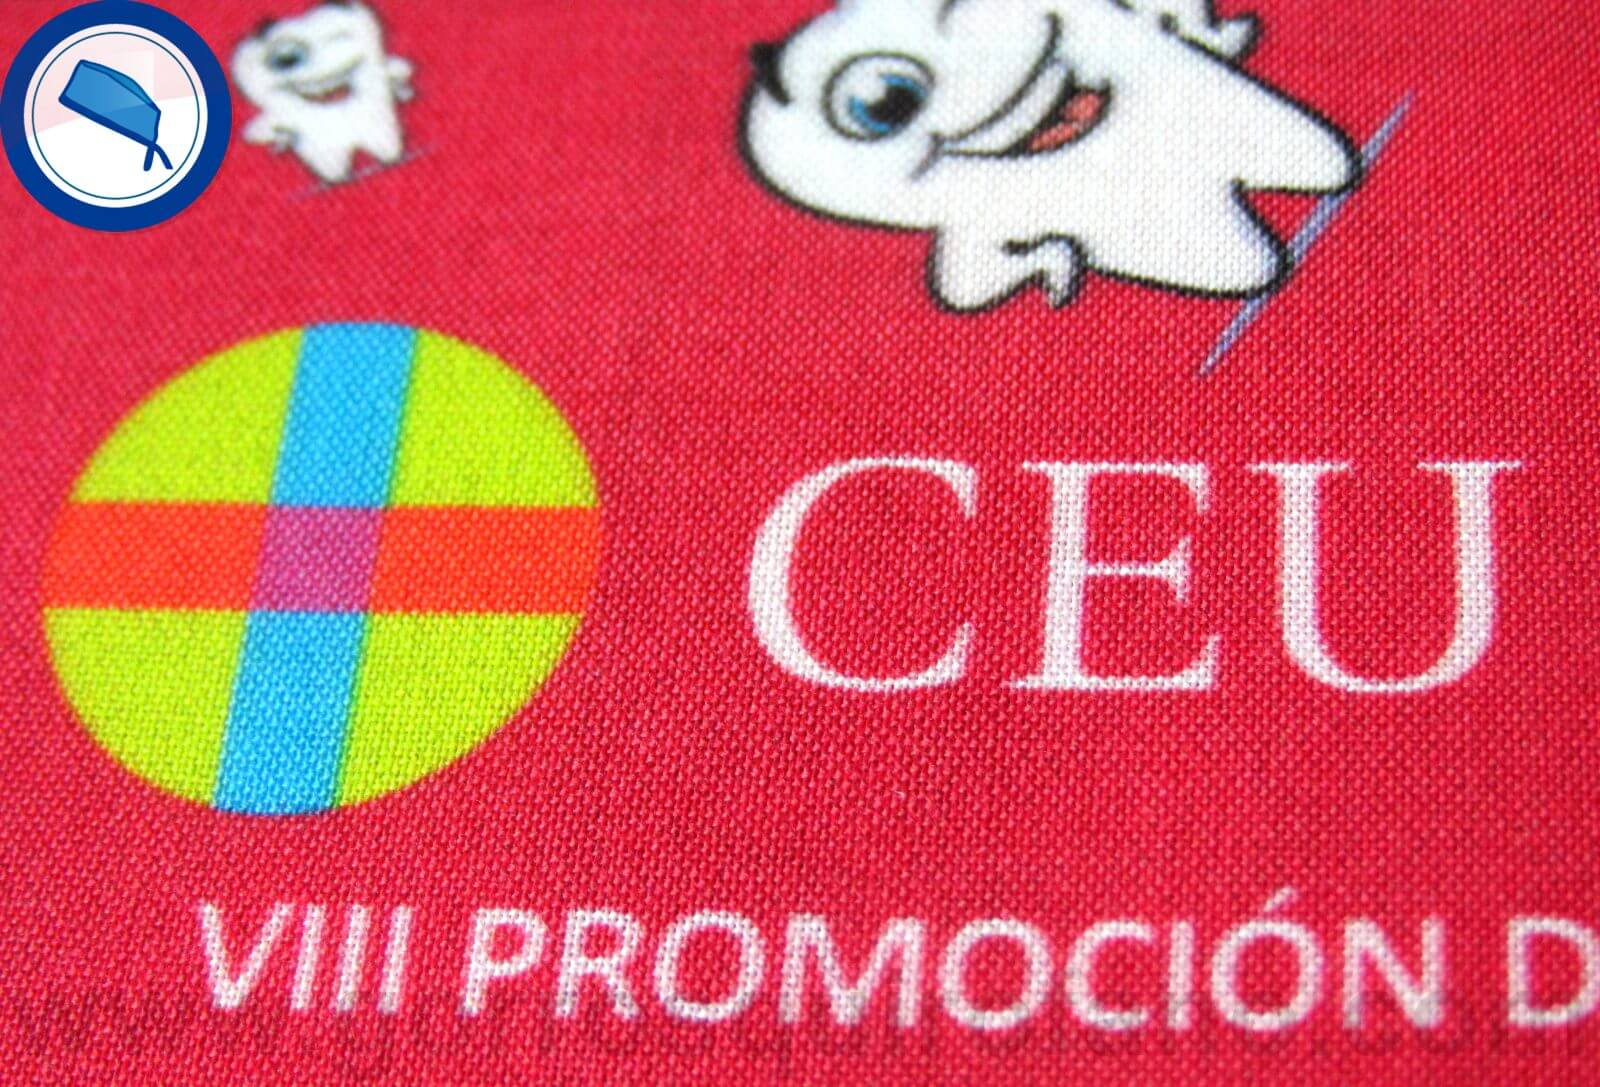 Gorros de quirofano Personalizados Universidades